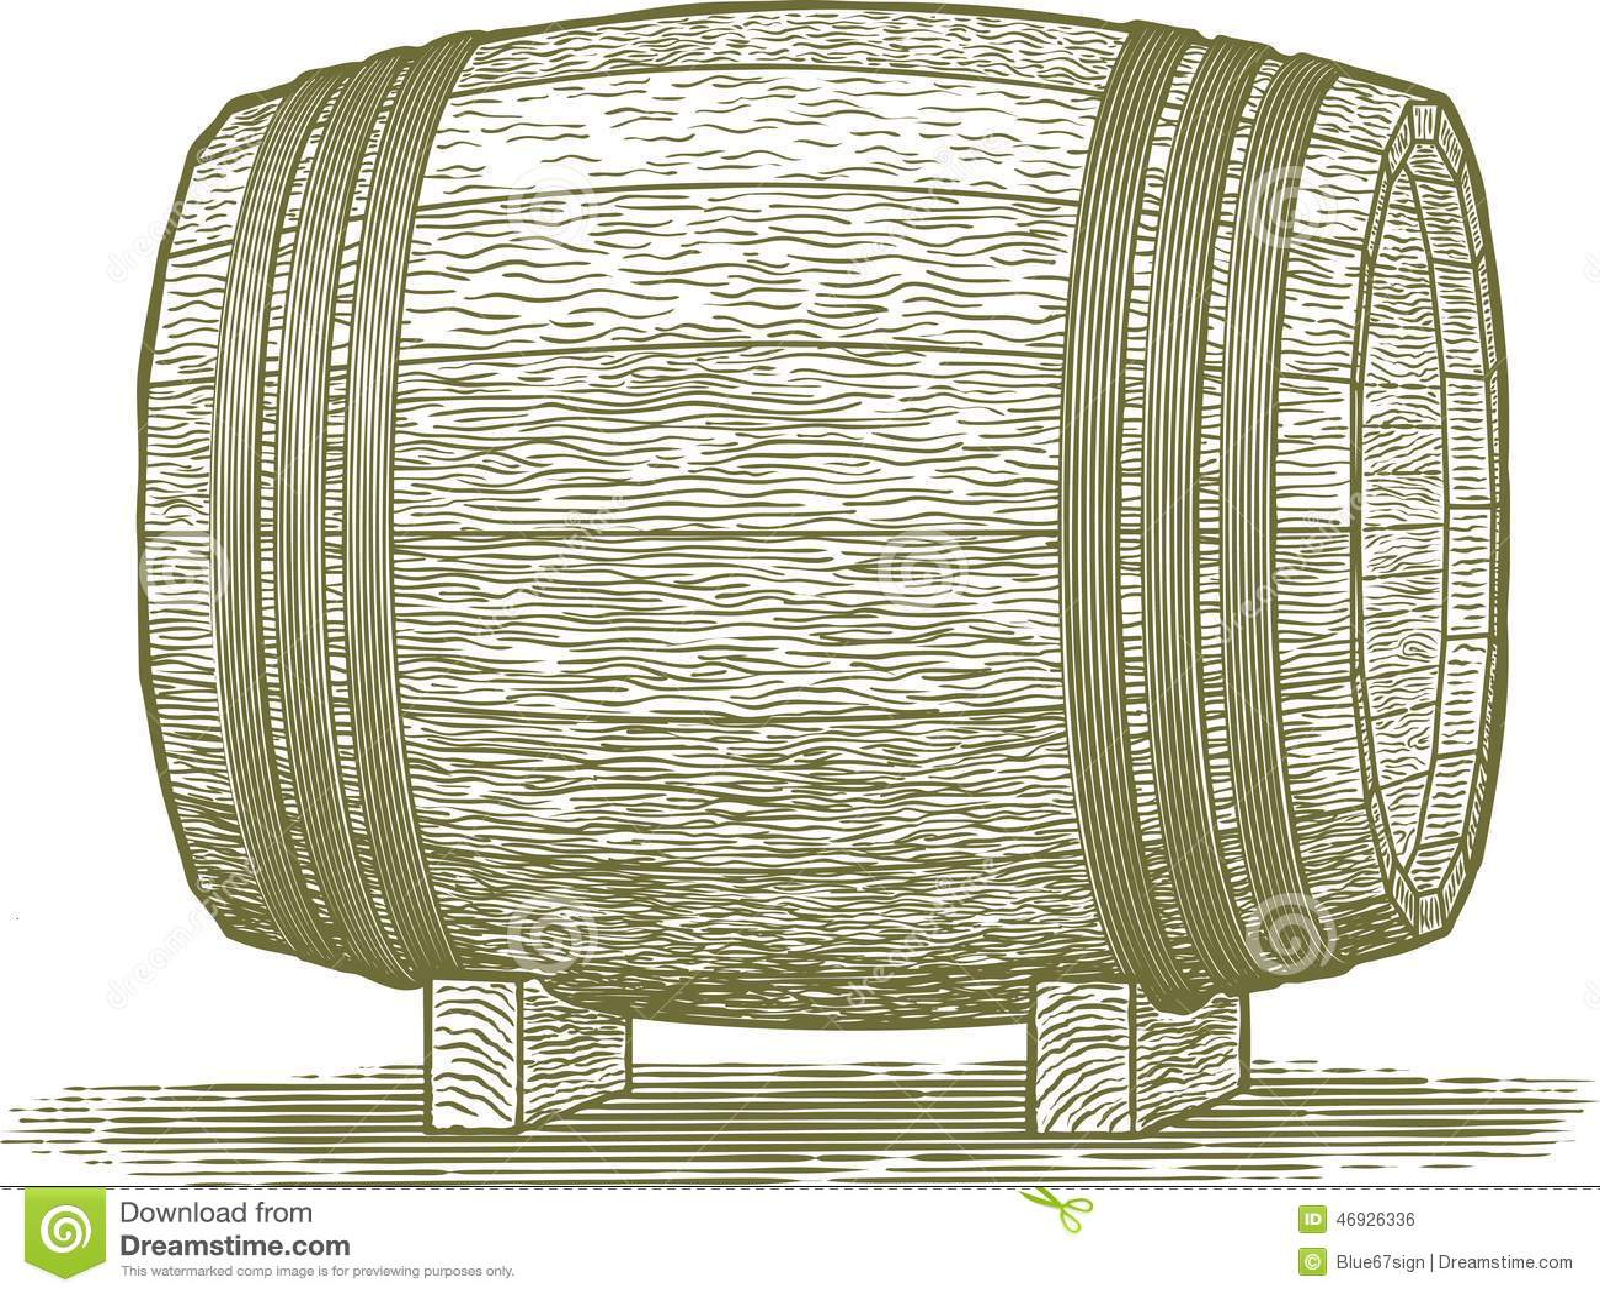 Vintage Whiskey Barrel Vector